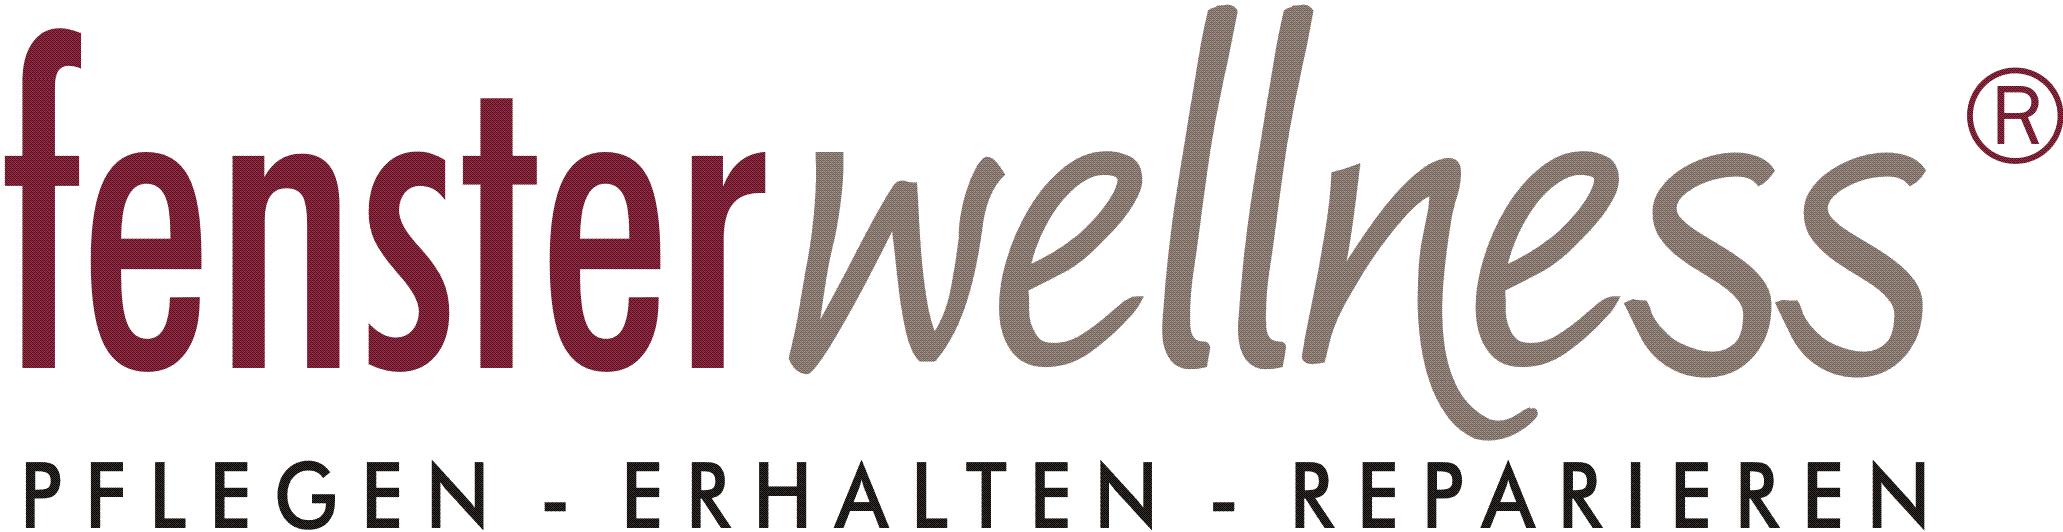 fensterwellness Logo